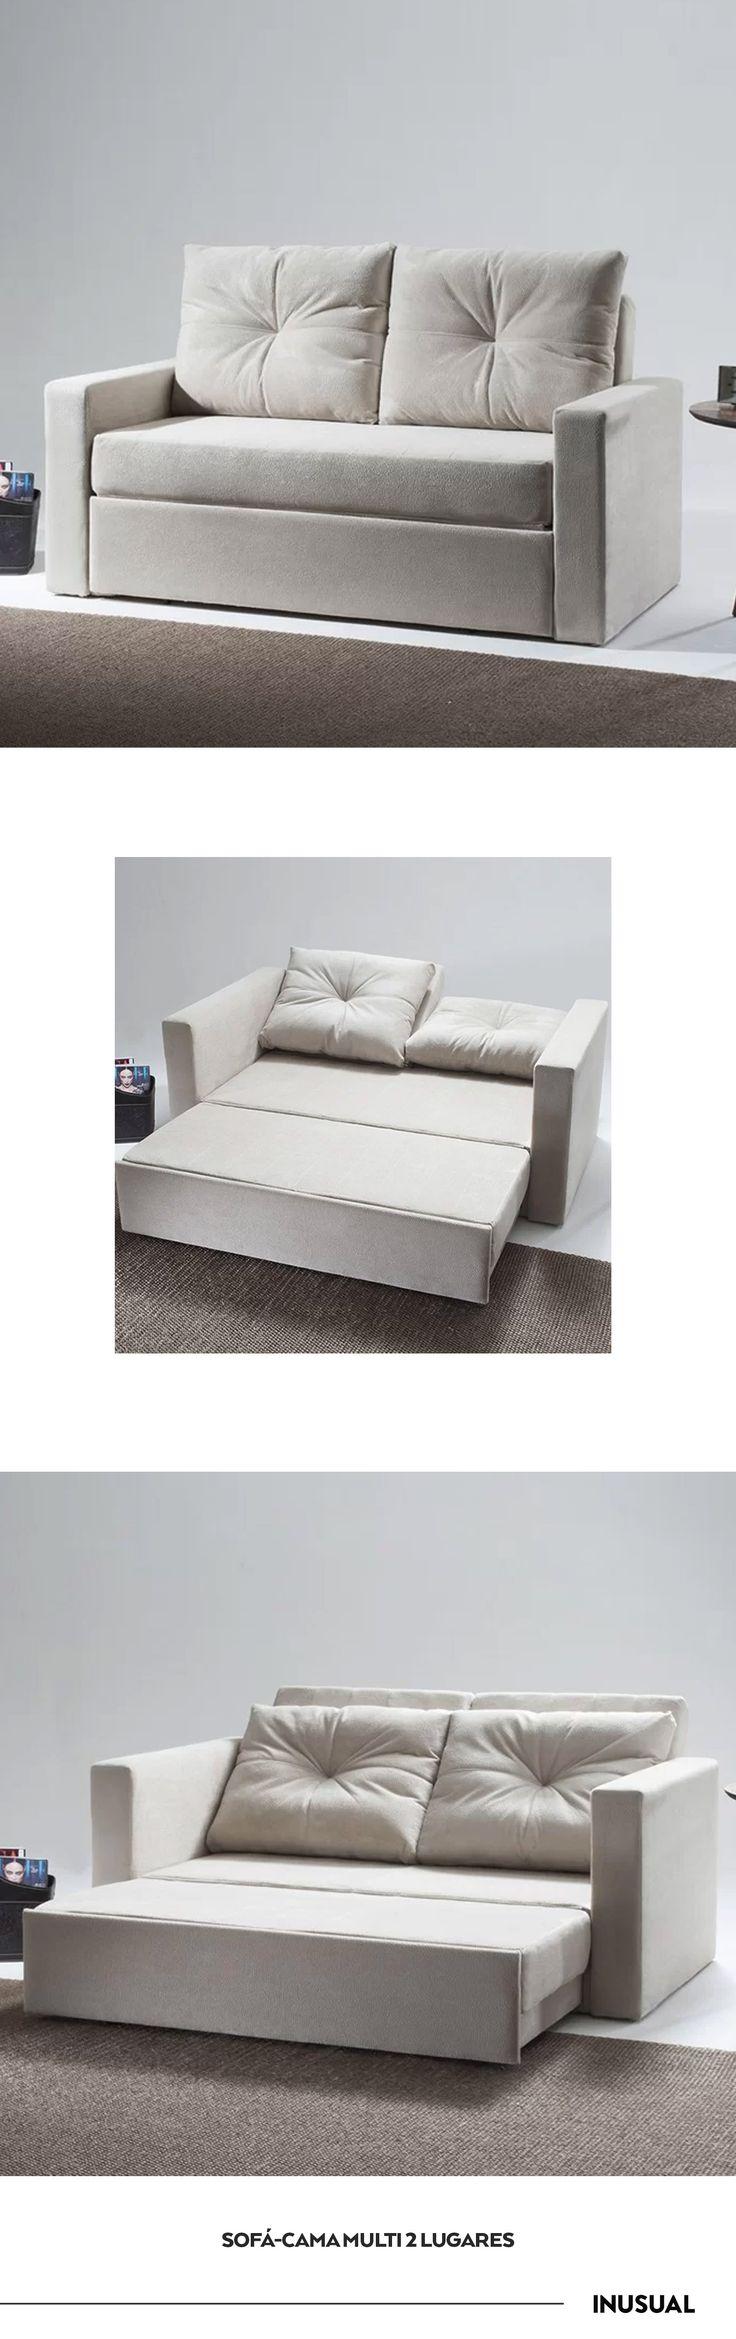 Sofá-cama Multi 2 Lugares - Inusual - Smart Decor